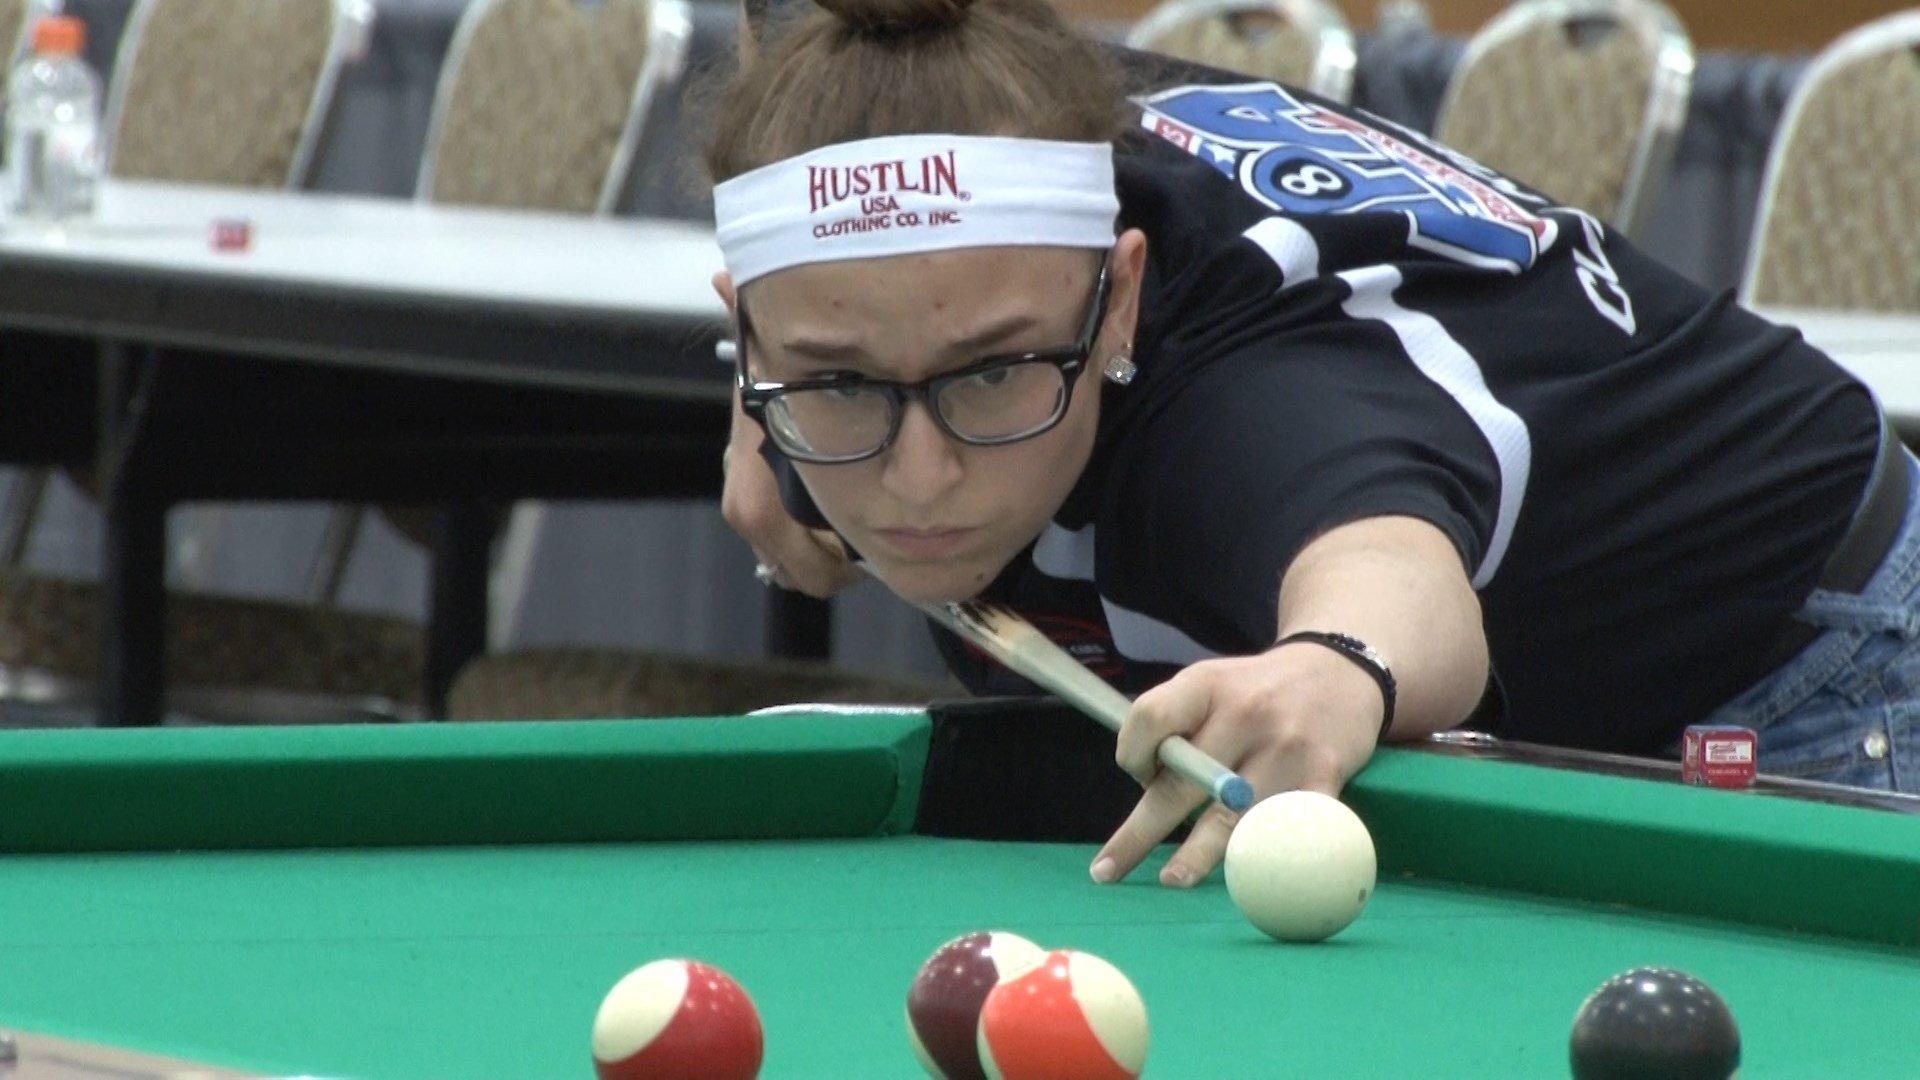 VNEA World Junior Pool Championship Wraps Up Erie News Now WICU - Pool table wraps